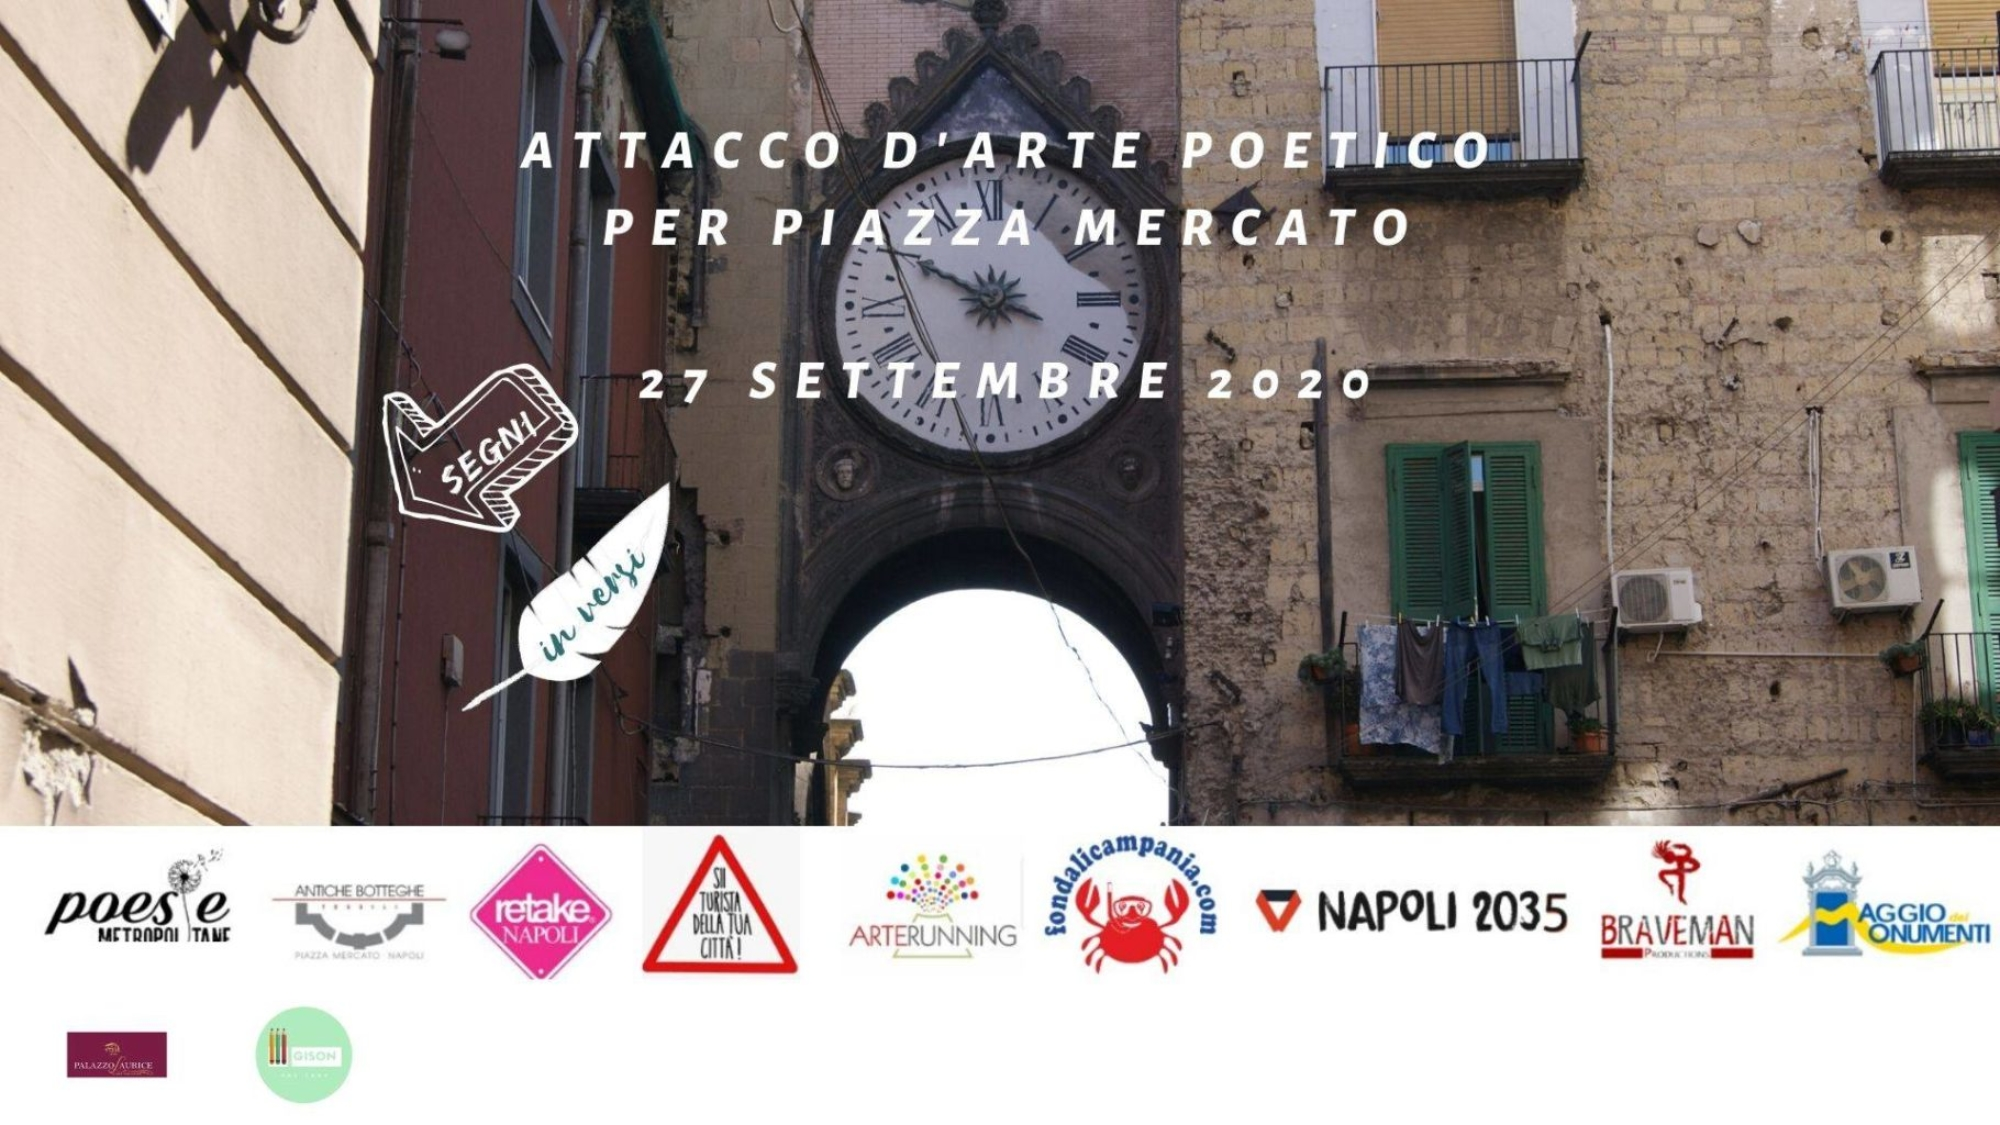 locandina evento poesie 27 settembre 2020